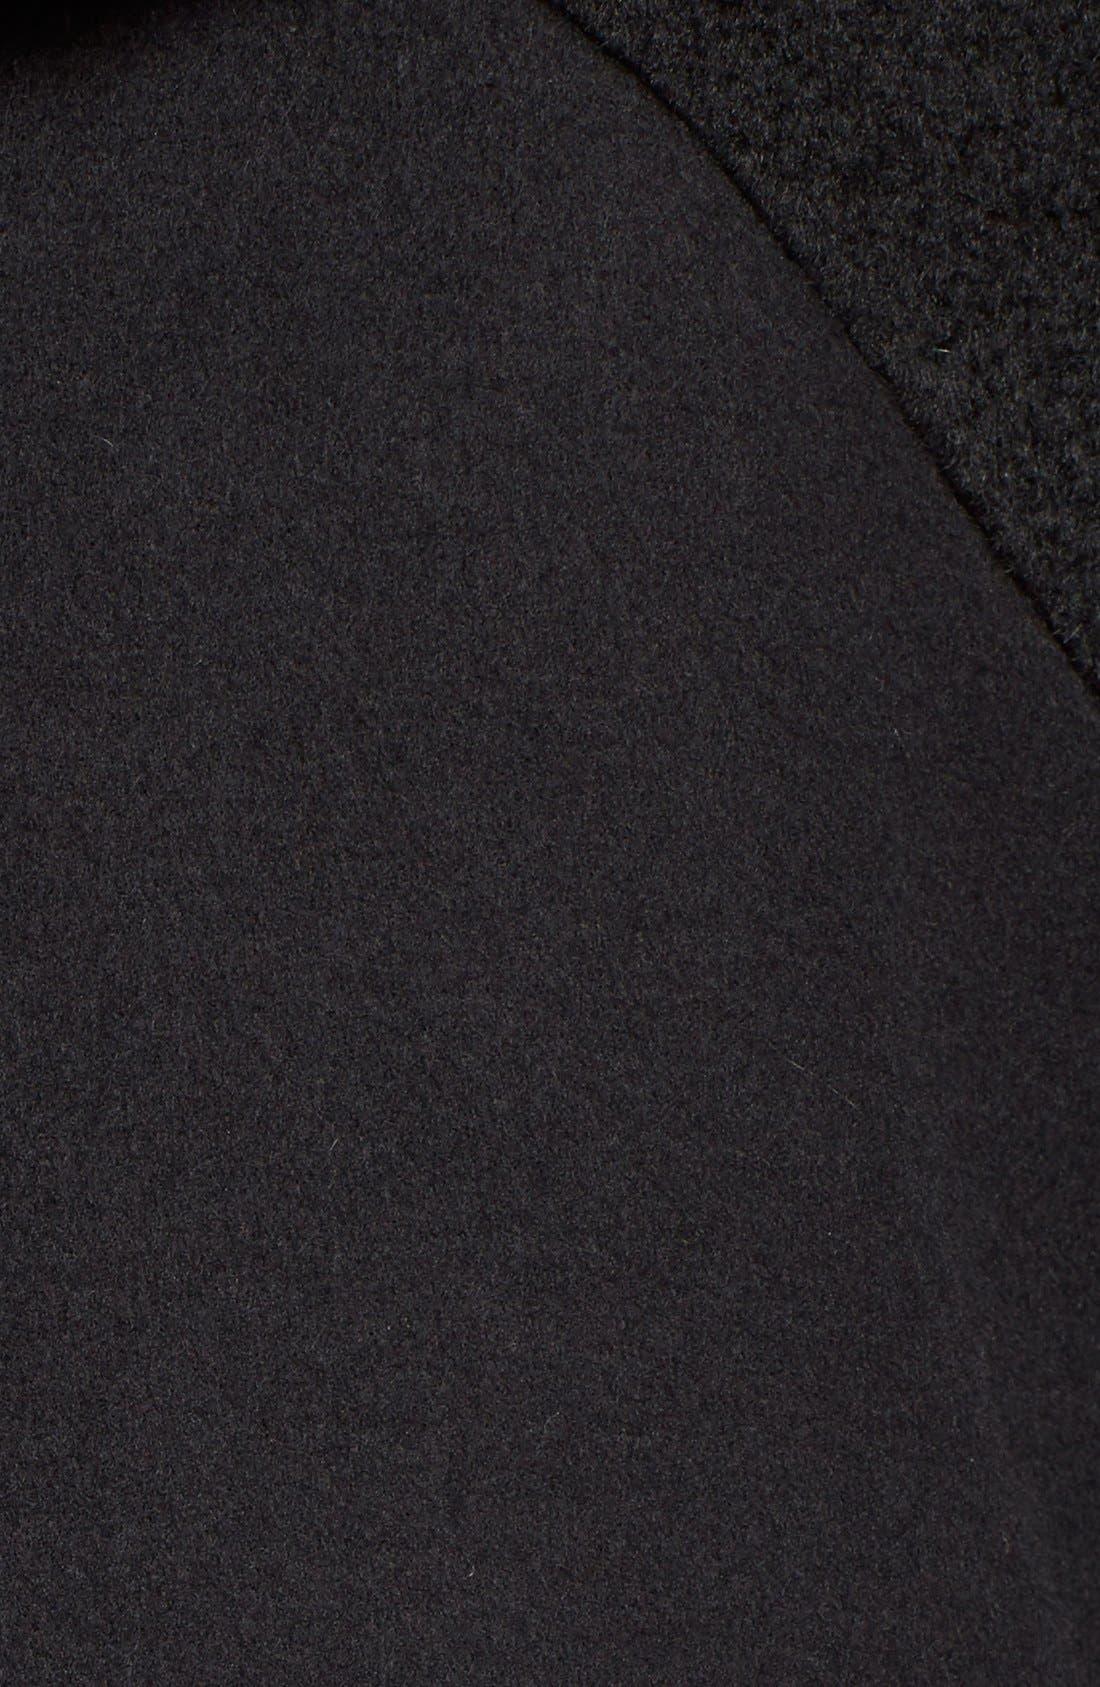 Alternate Image 5  - Dawn Levy 'Lara' Mixed Media Wool Blend Coat withFauxFur Hood